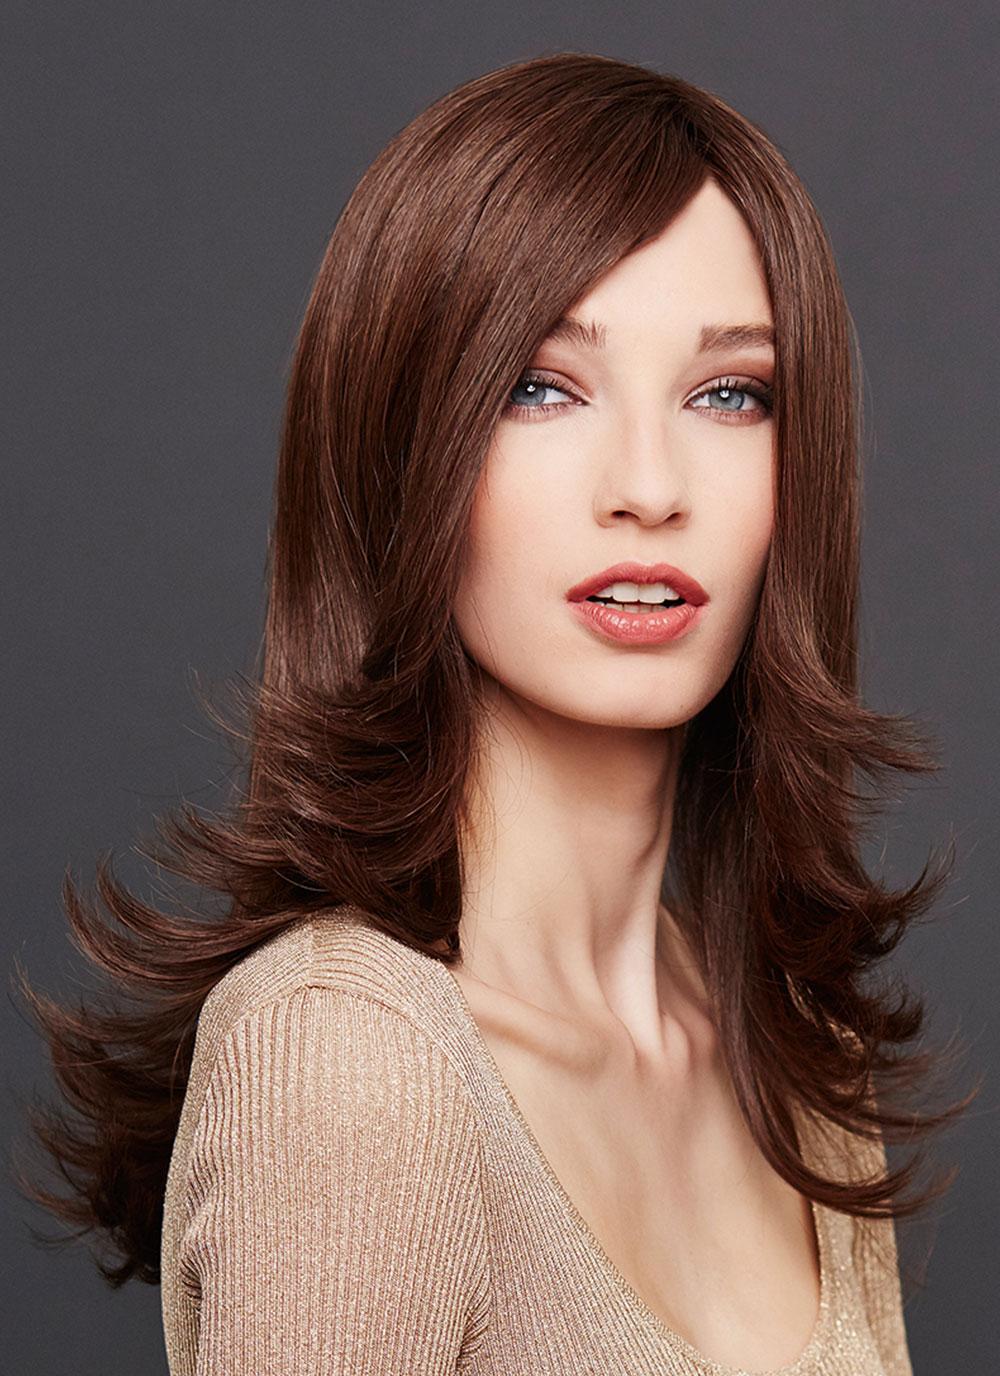 peruca par natural, peruca echthaar layered, peruci satu mare, peruci satu-mare, peruca satu mare, peruca gisela mayer